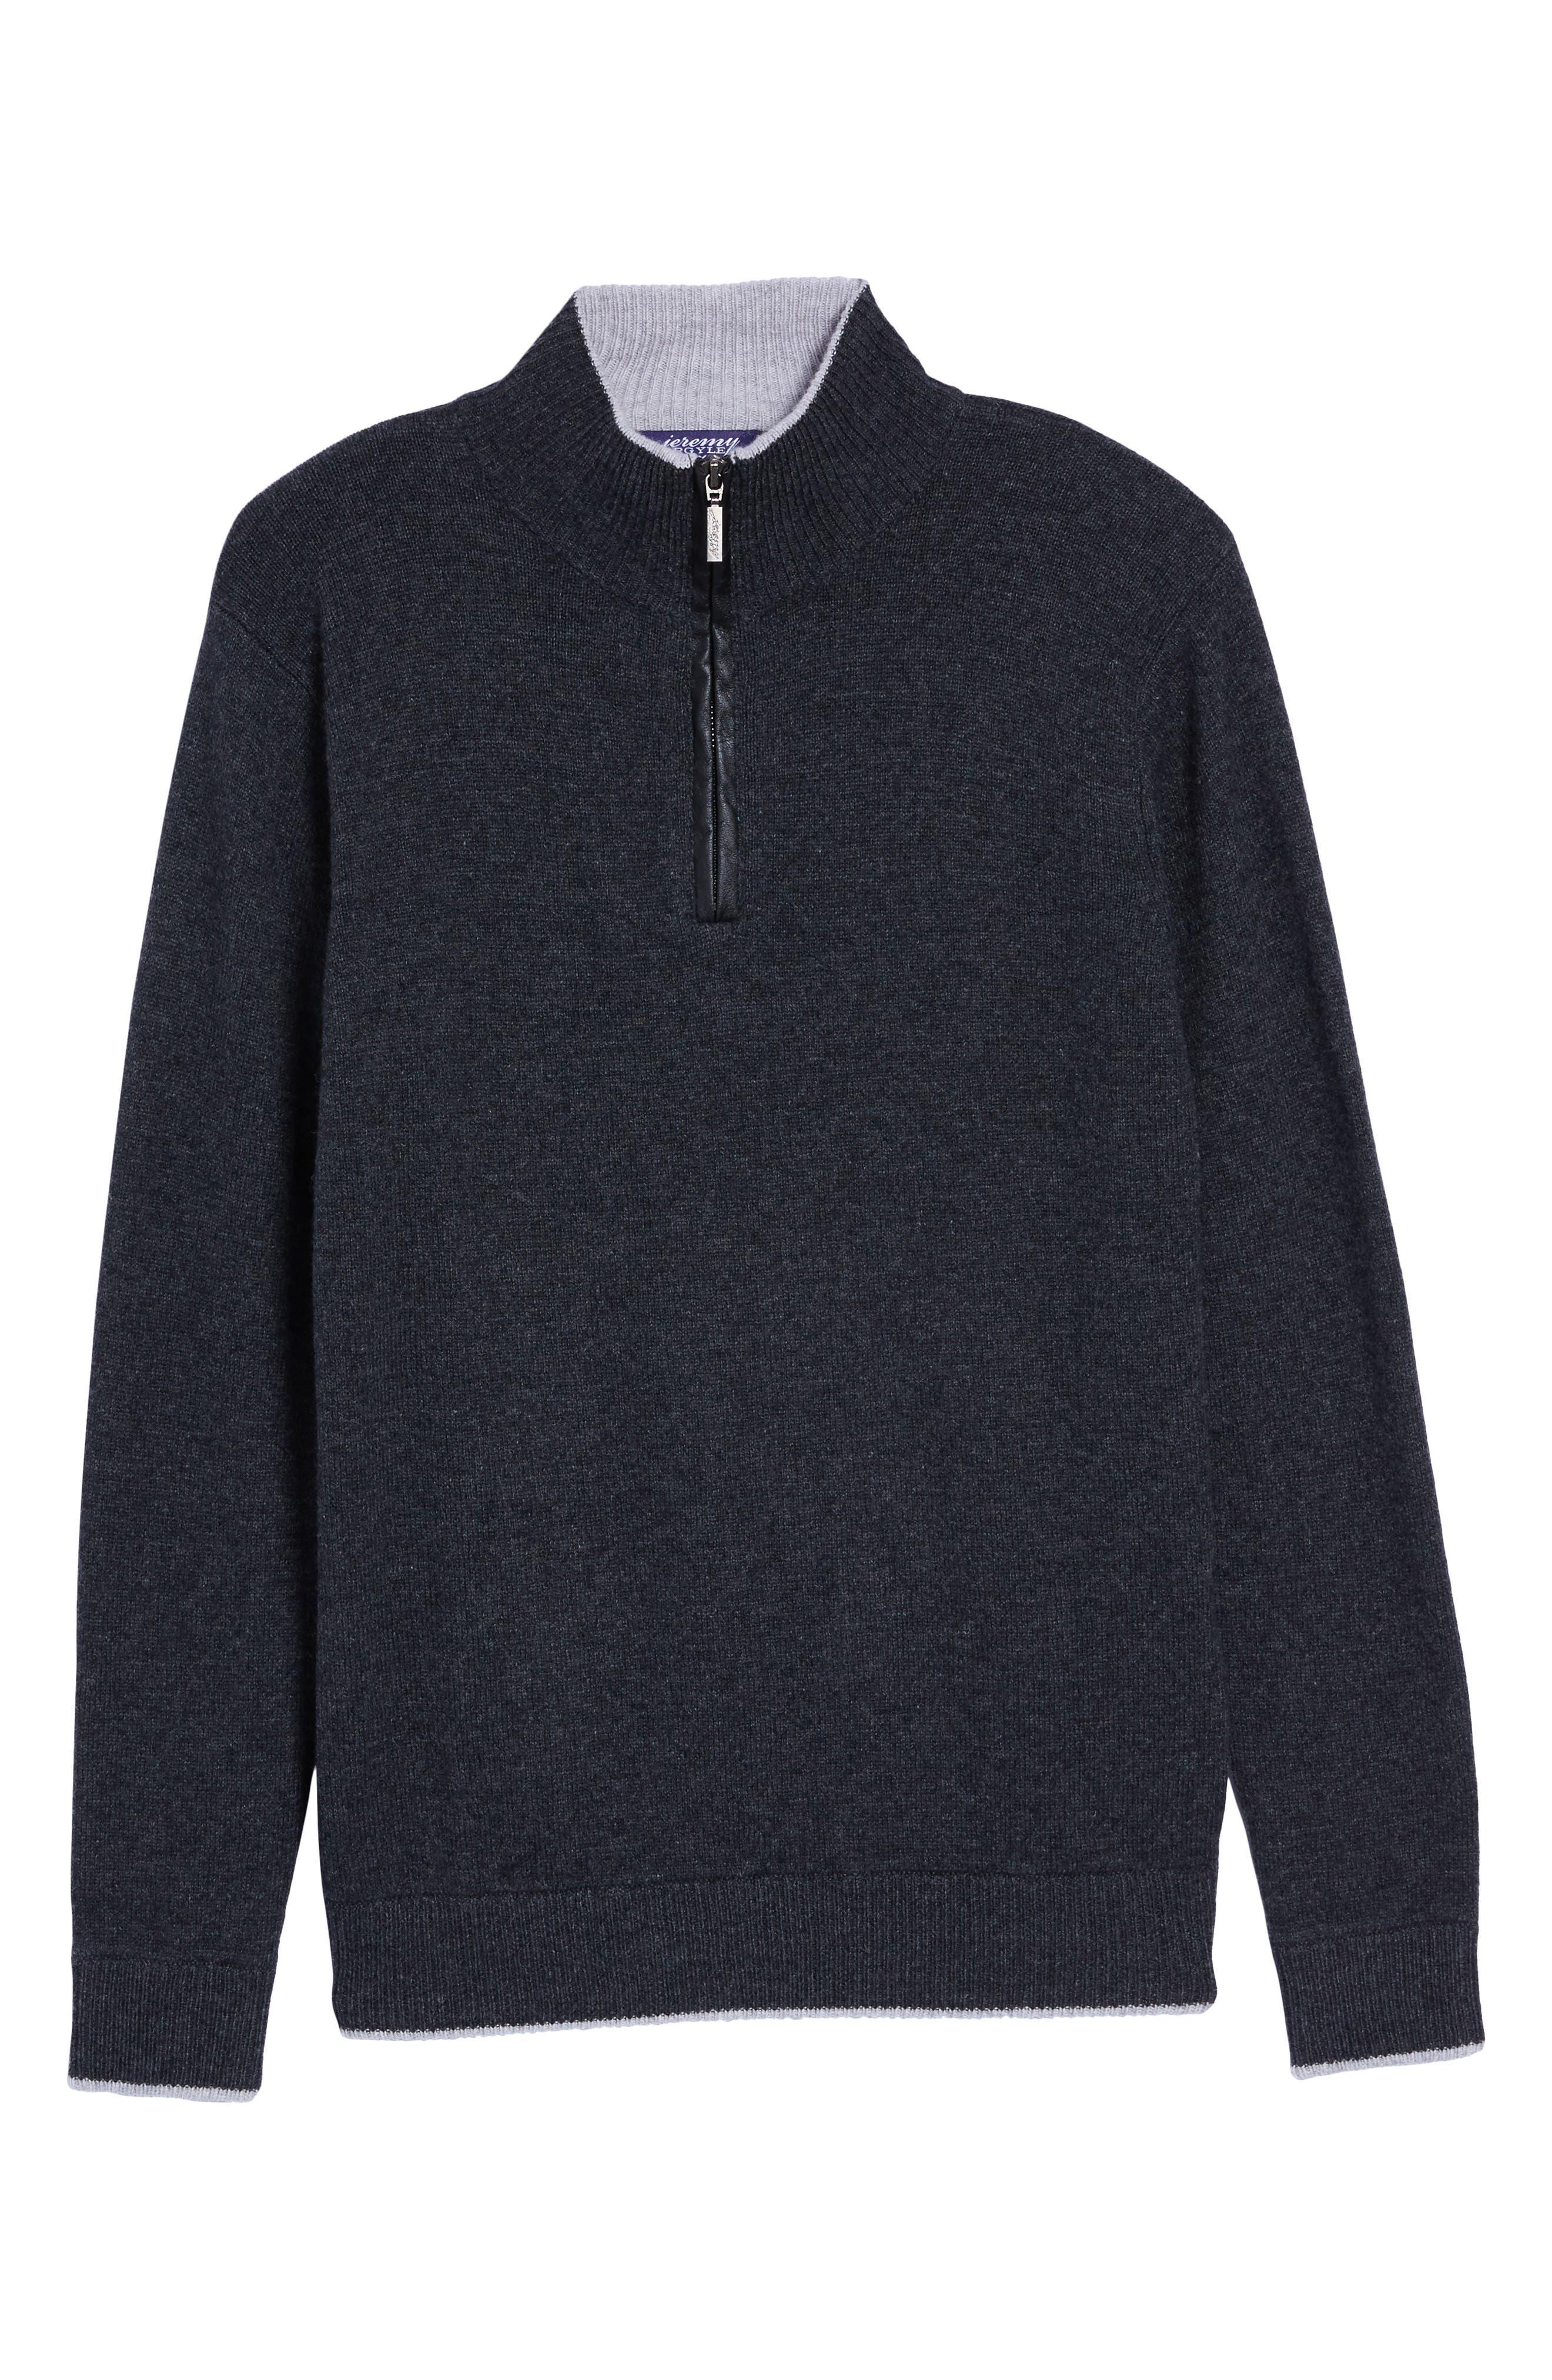 Wool Blend Quarter Zip Sweater,                             Alternate thumbnail 6, color,                             025